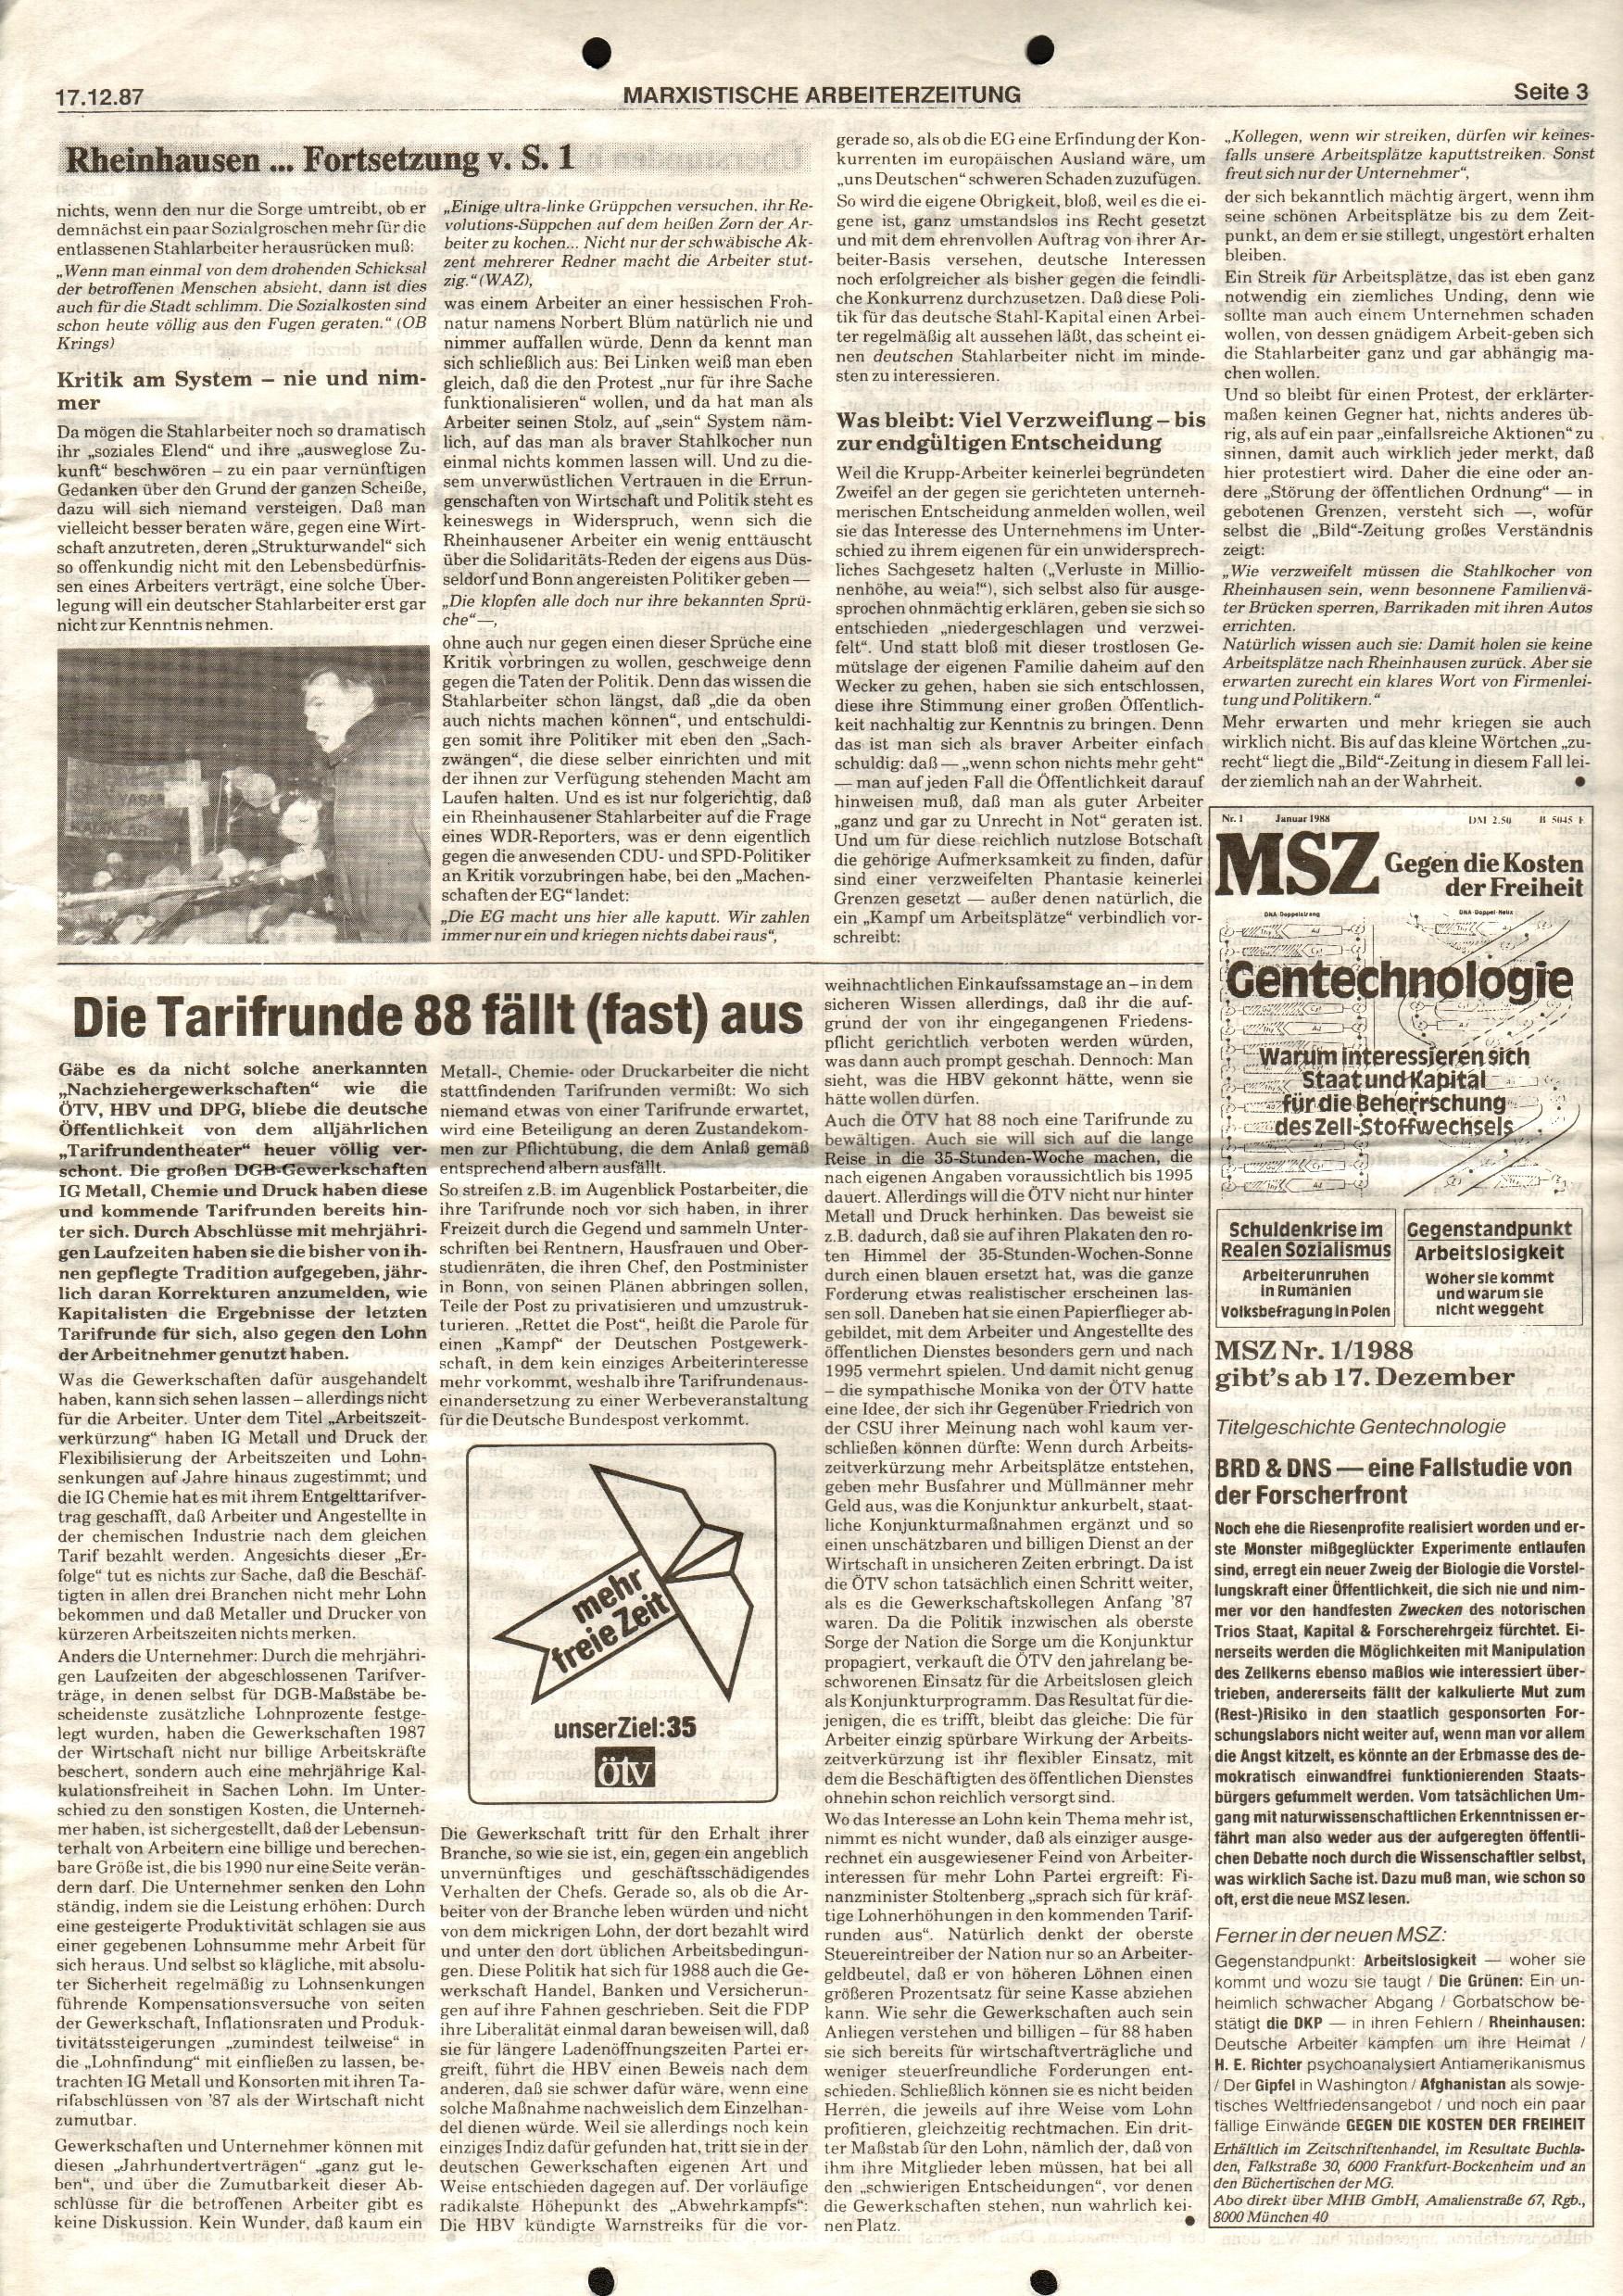 Frankfurt_CPK_Hoechst_MAZ483